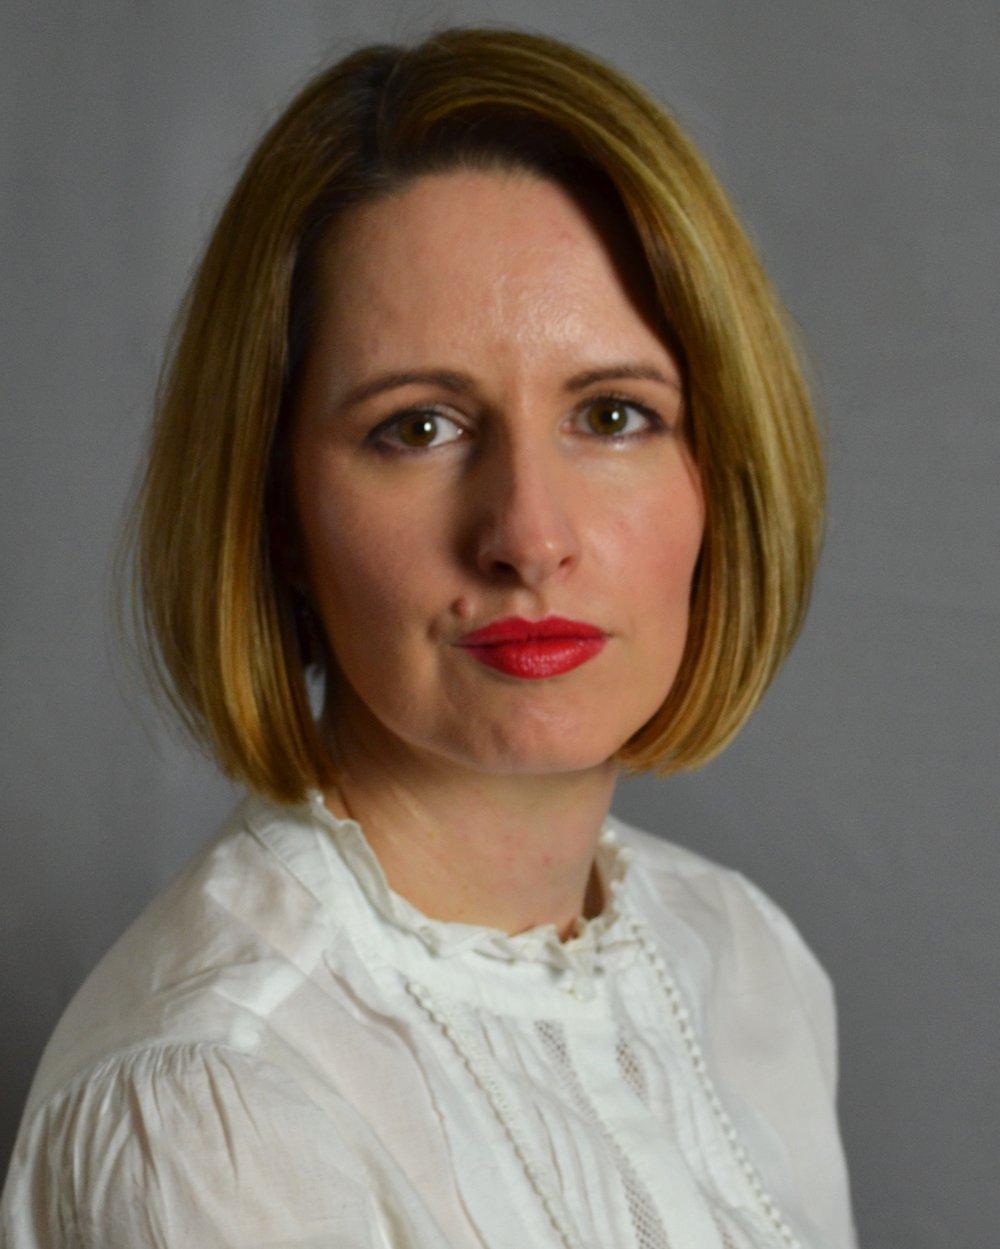 Helen Pimlott